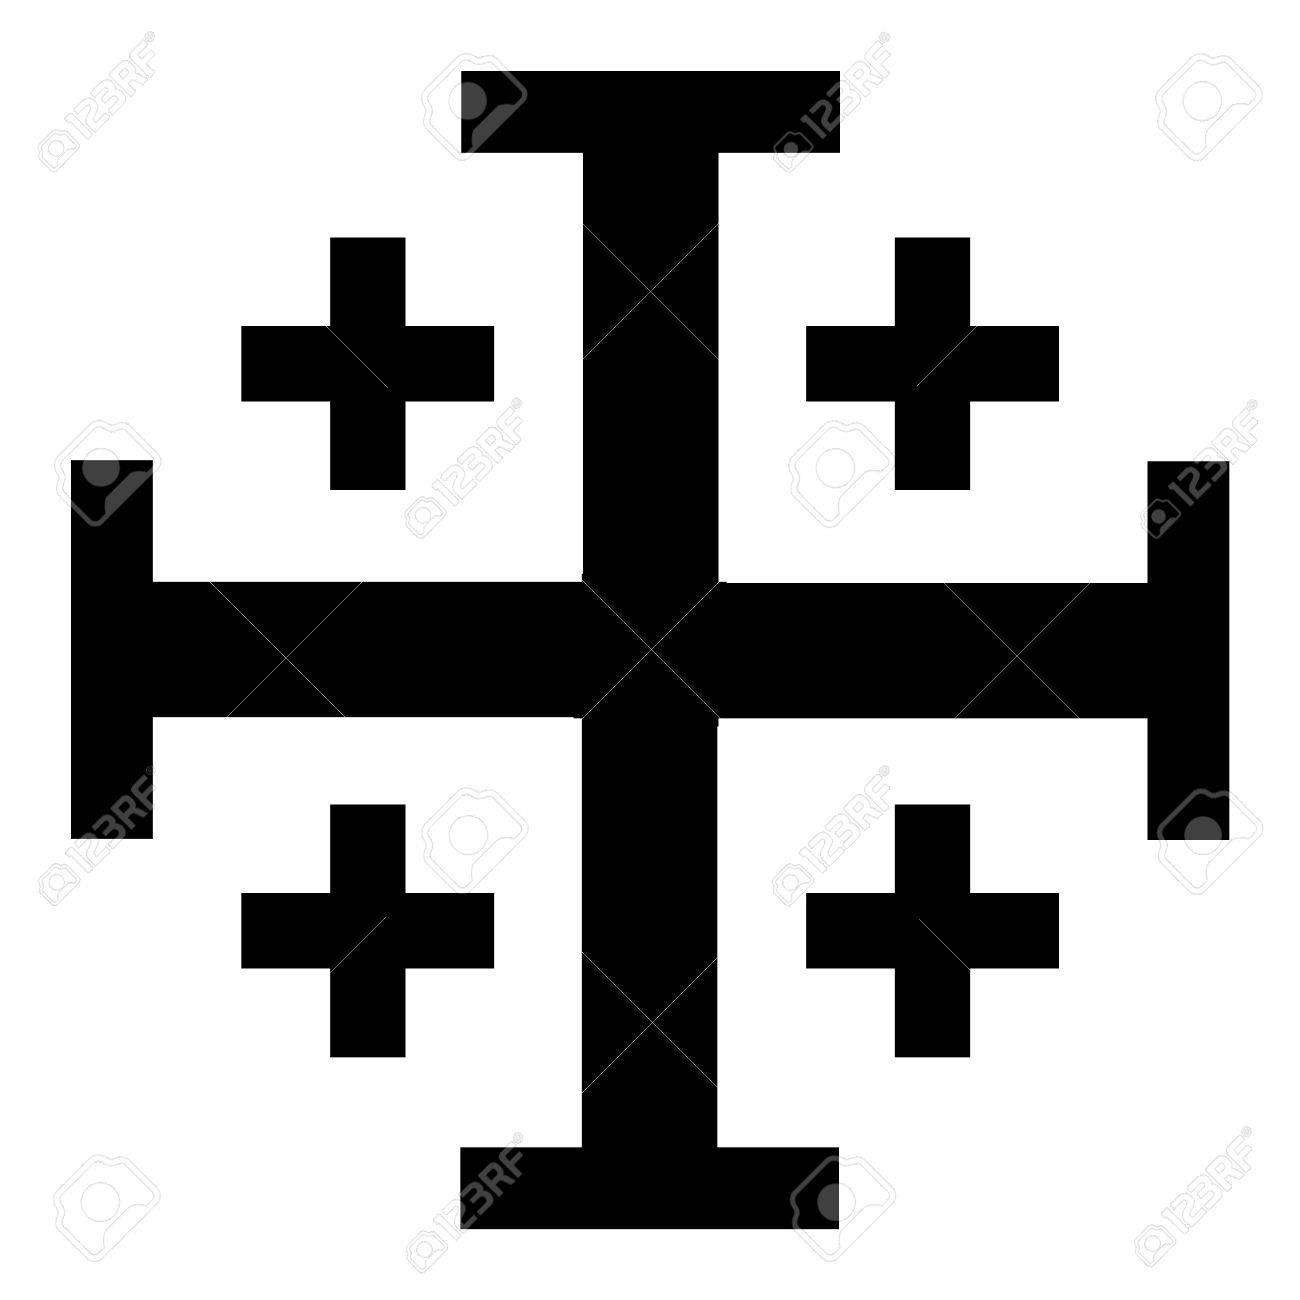 Vector illustration black Jerusalem cross. Cross of Knightly Order of the Holy Sepulchre of Jerusalem - 81378841